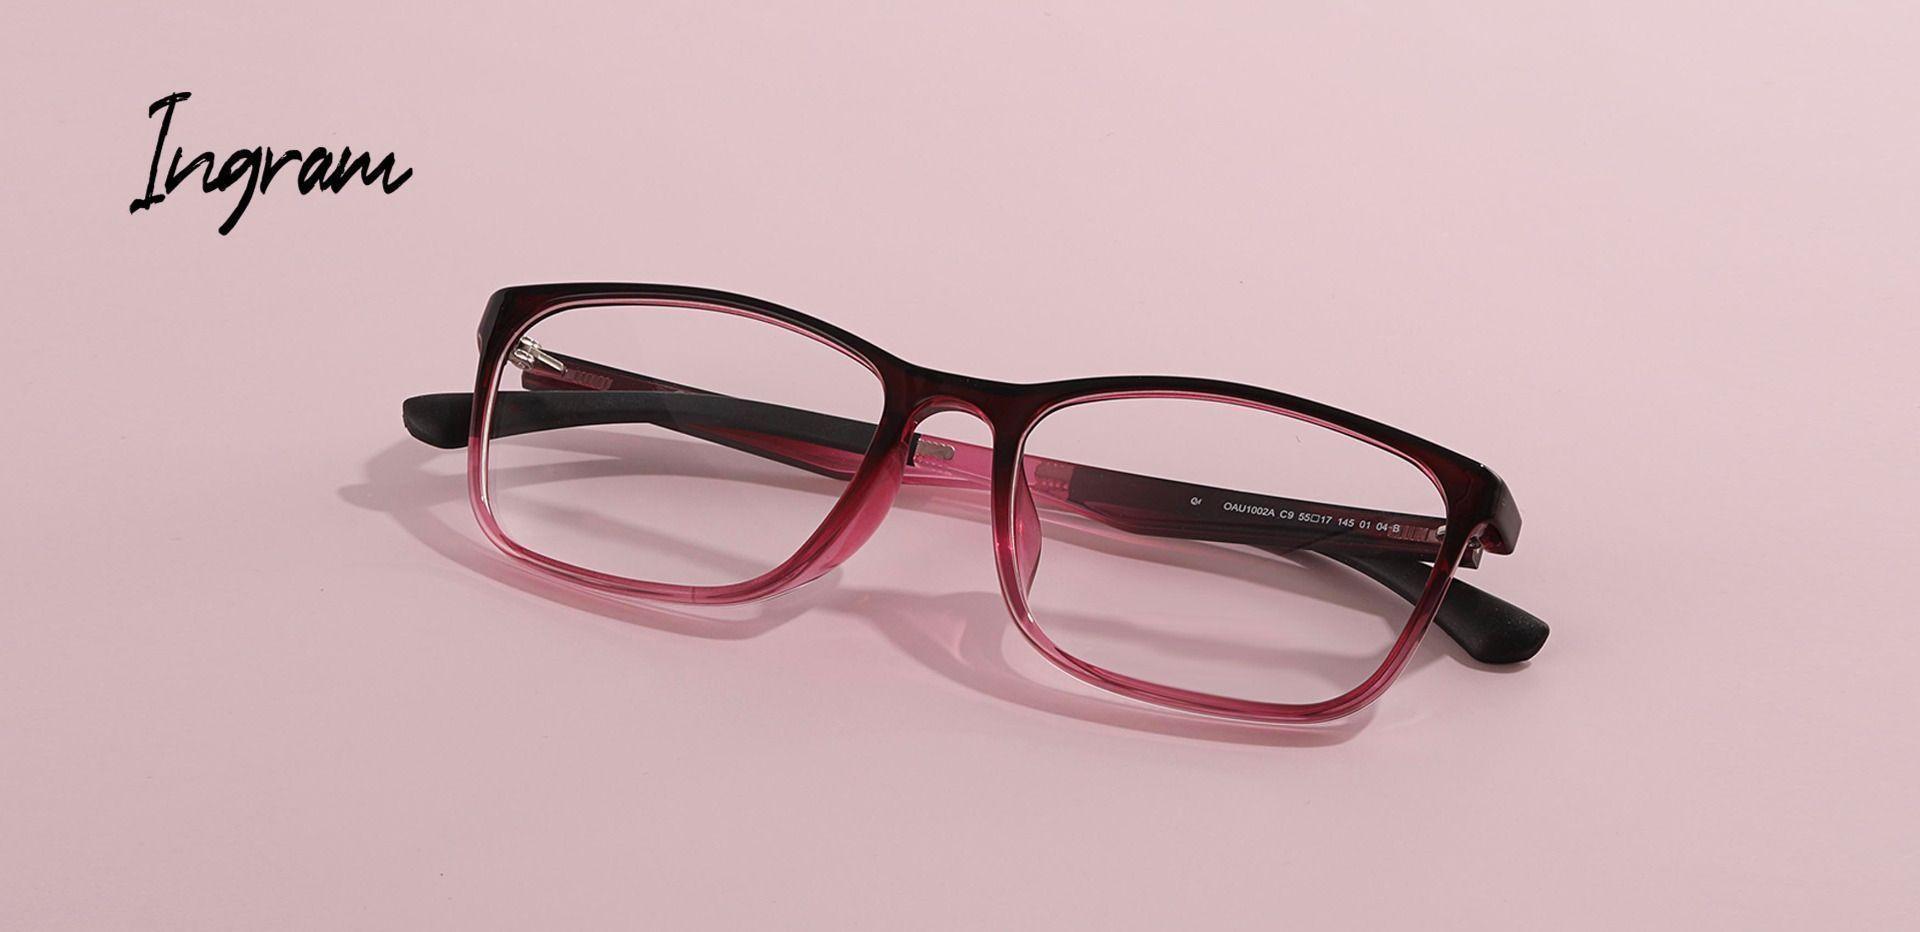 Ingram Rectangle Prescription Glasses - Pink Fade